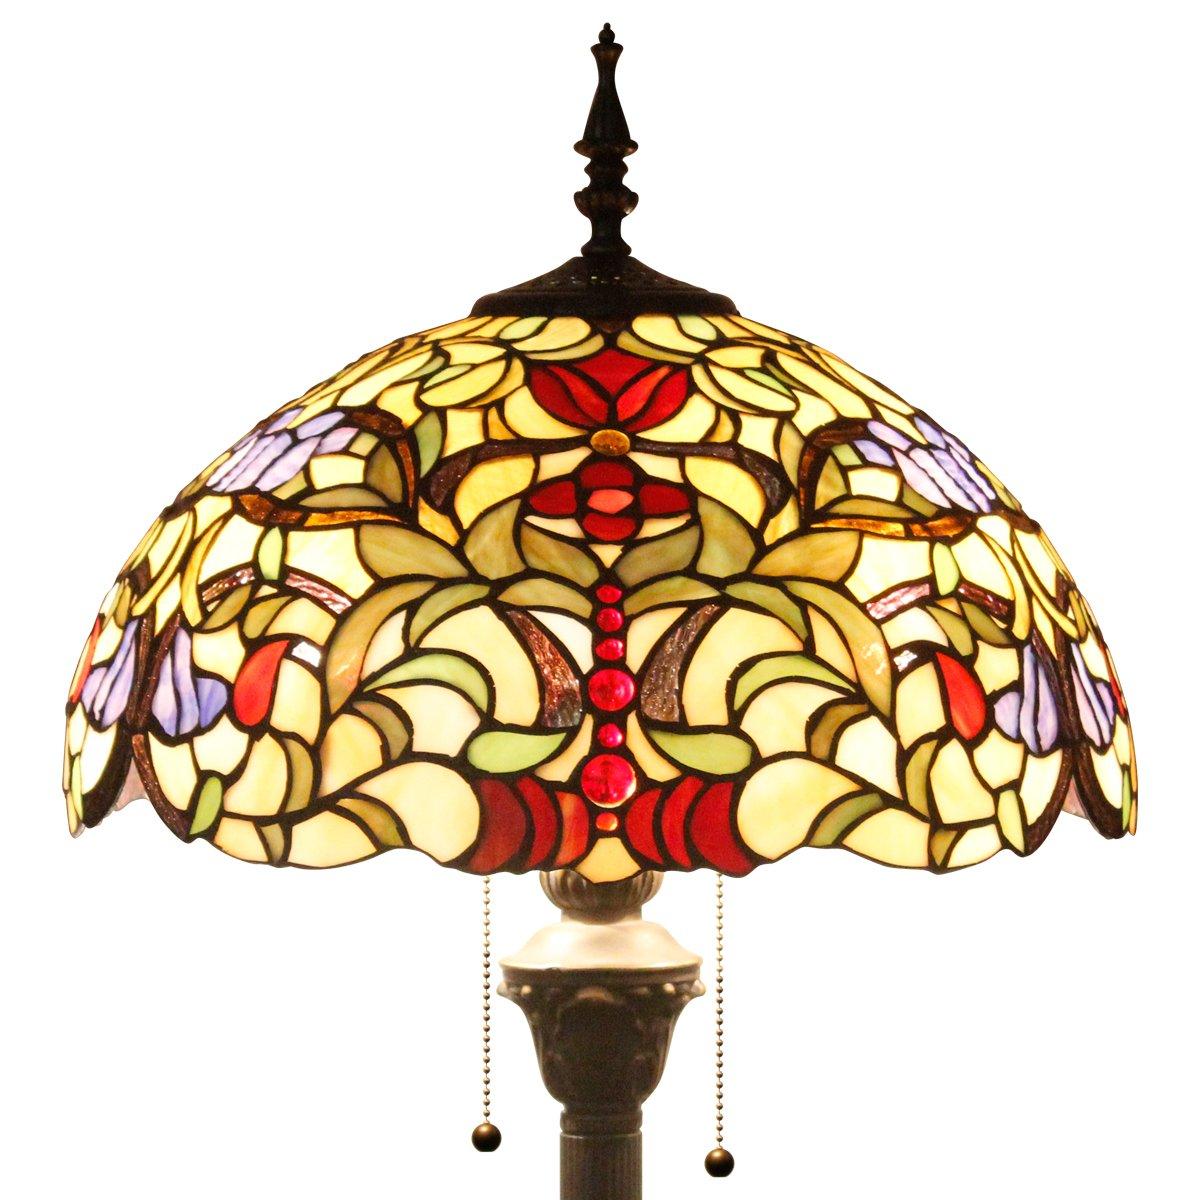 16F01S523 Tiffany style floor lamp light W16 inch sea blue dragonfly shade E26 (S512 Series)